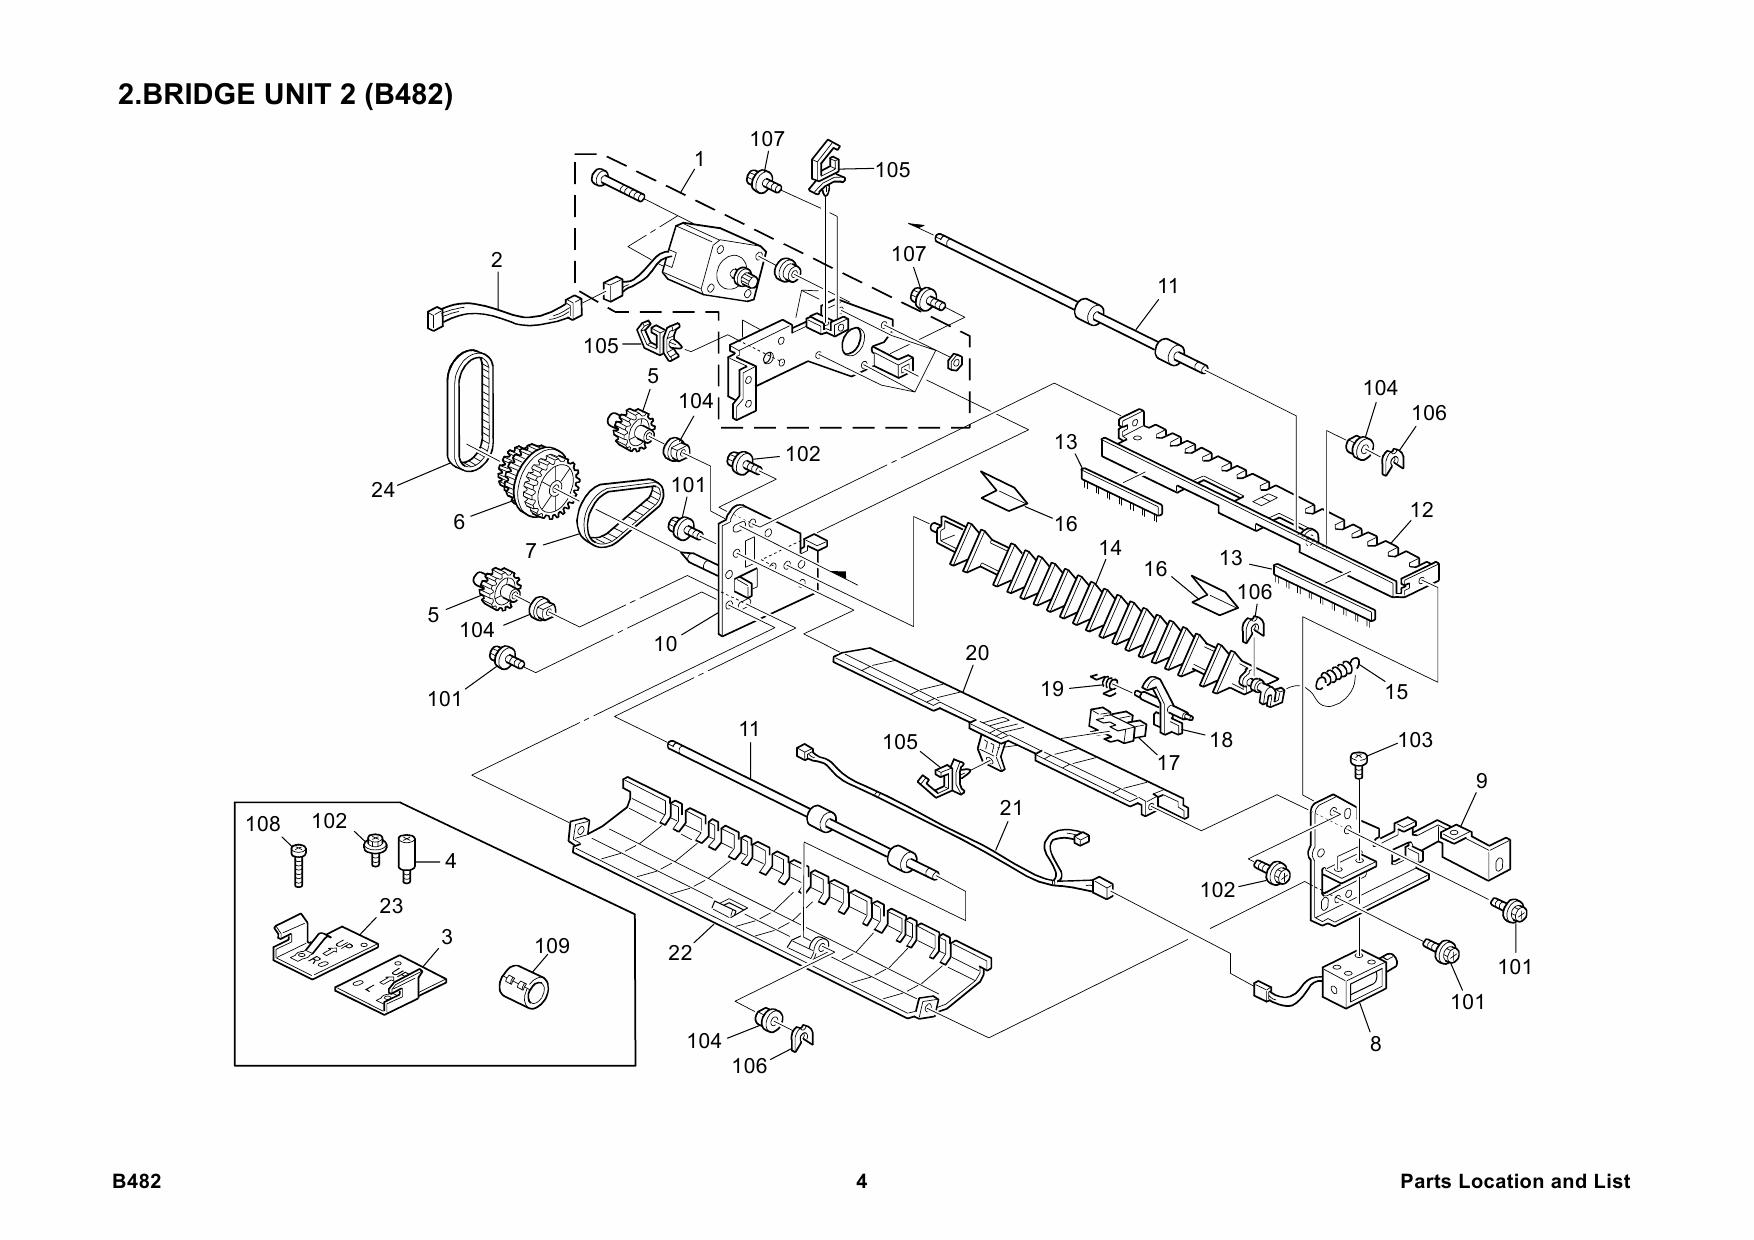 ricoh options b482 bridge